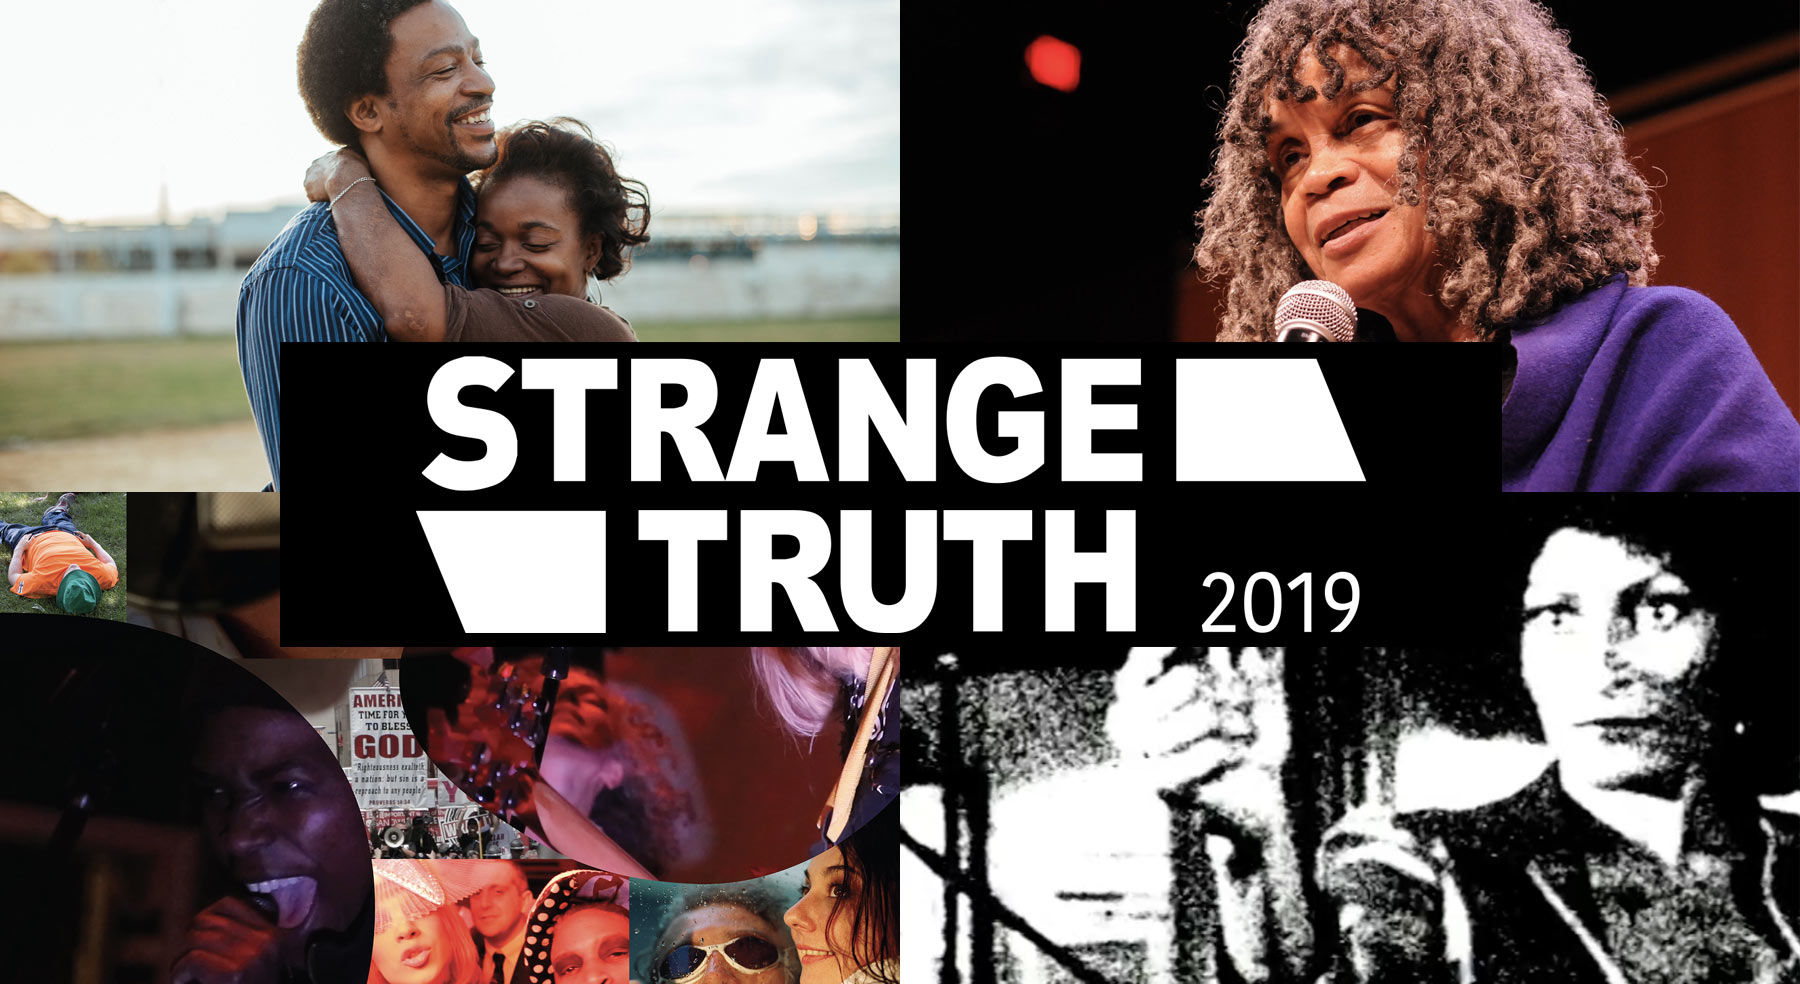 Strange Truth 2019